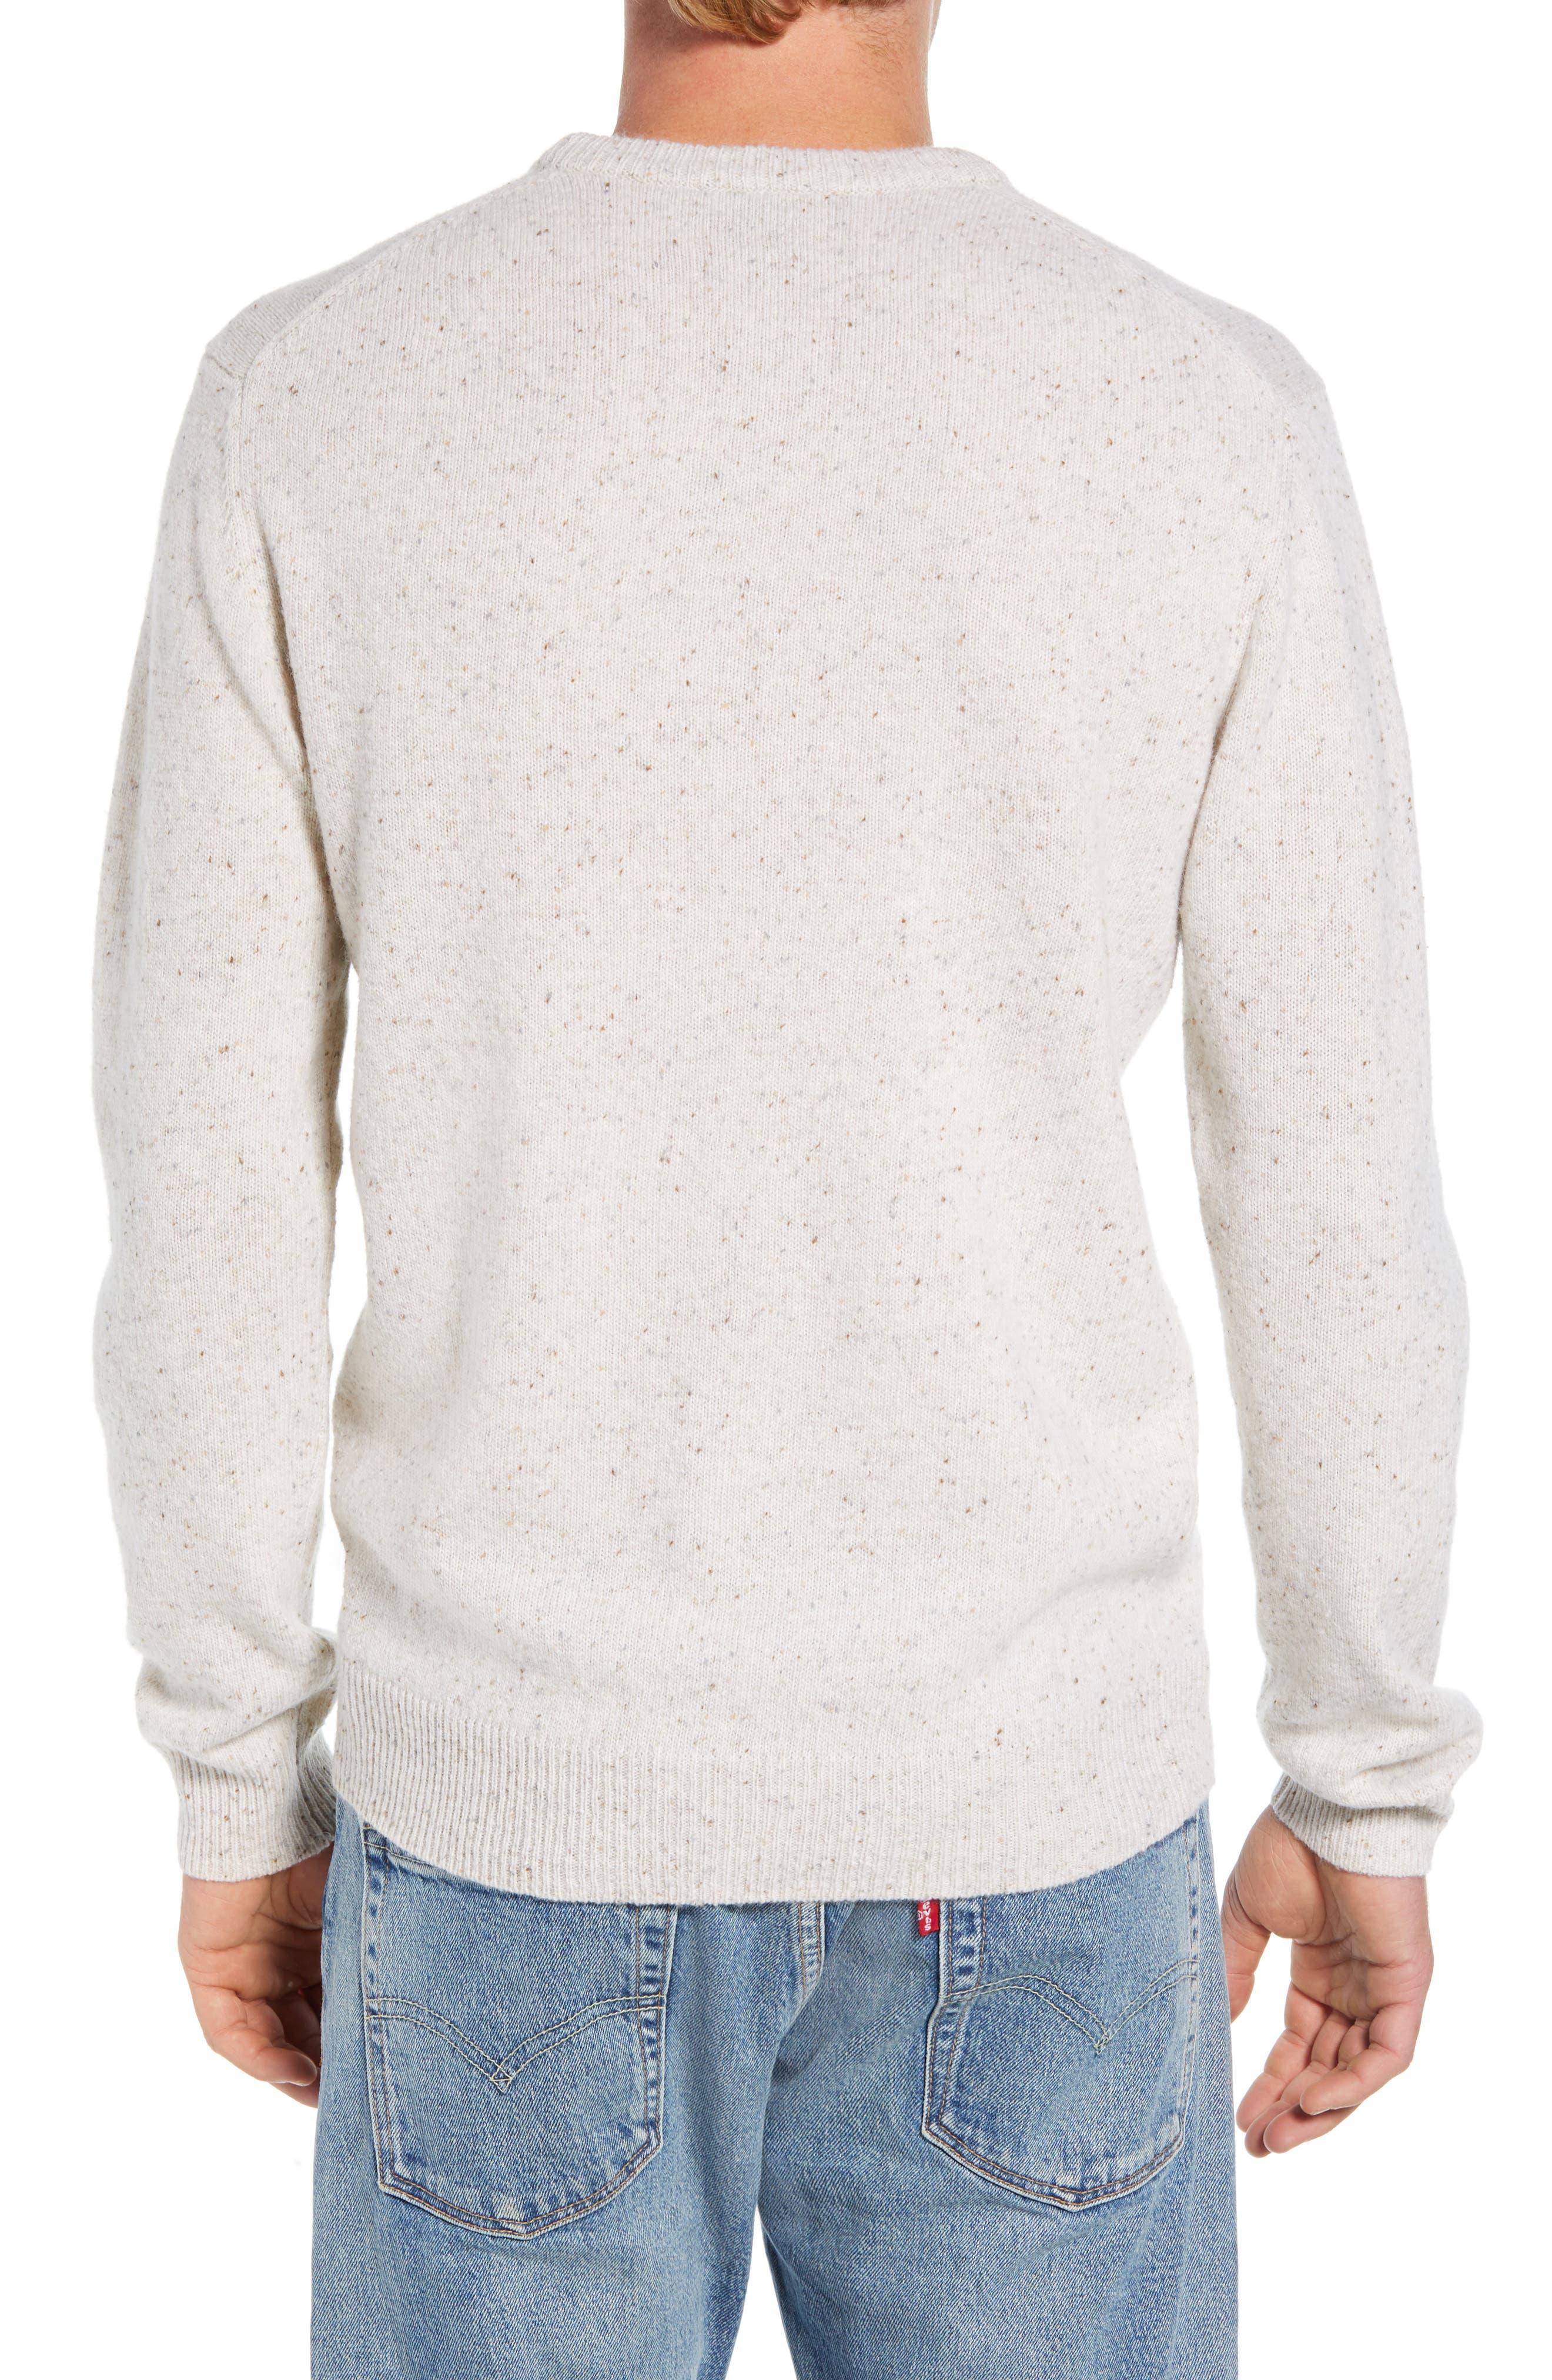 Donegal Sweater,                             Alternate thumbnail 2, color,                             CUBA WHITE